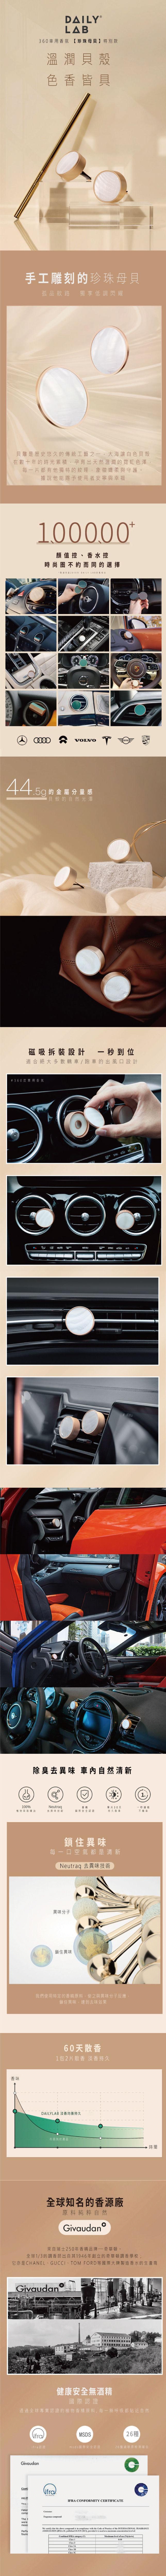 DAILY LAB|360° 限量貝殼款 車用香氛